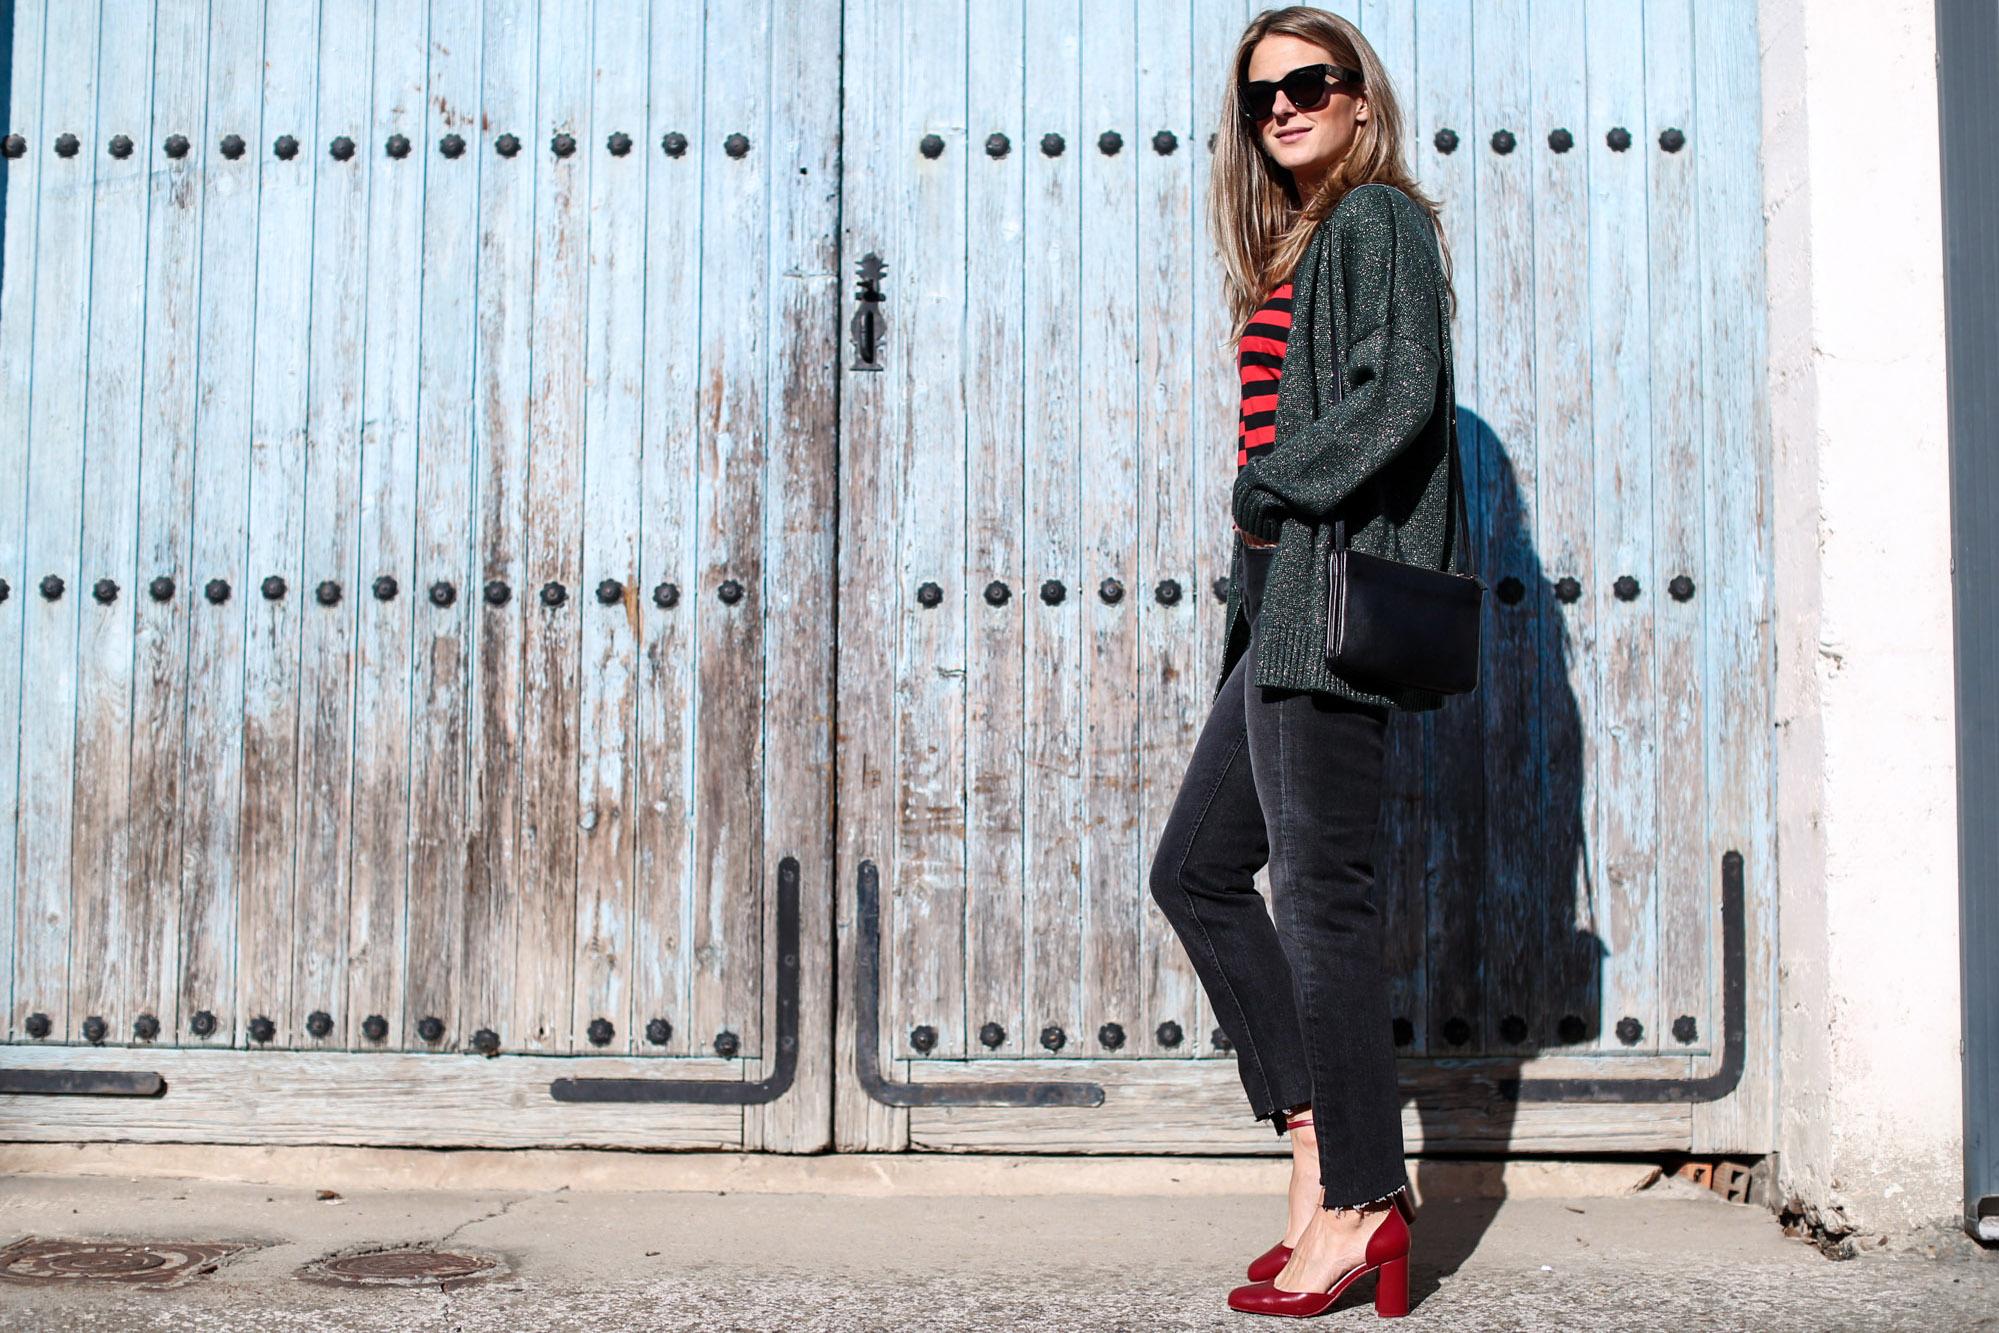 clochet_streetstyle_fashionblogger_zapatostaconrojospielzara_bolsotrioceline_momjeansh&m-3